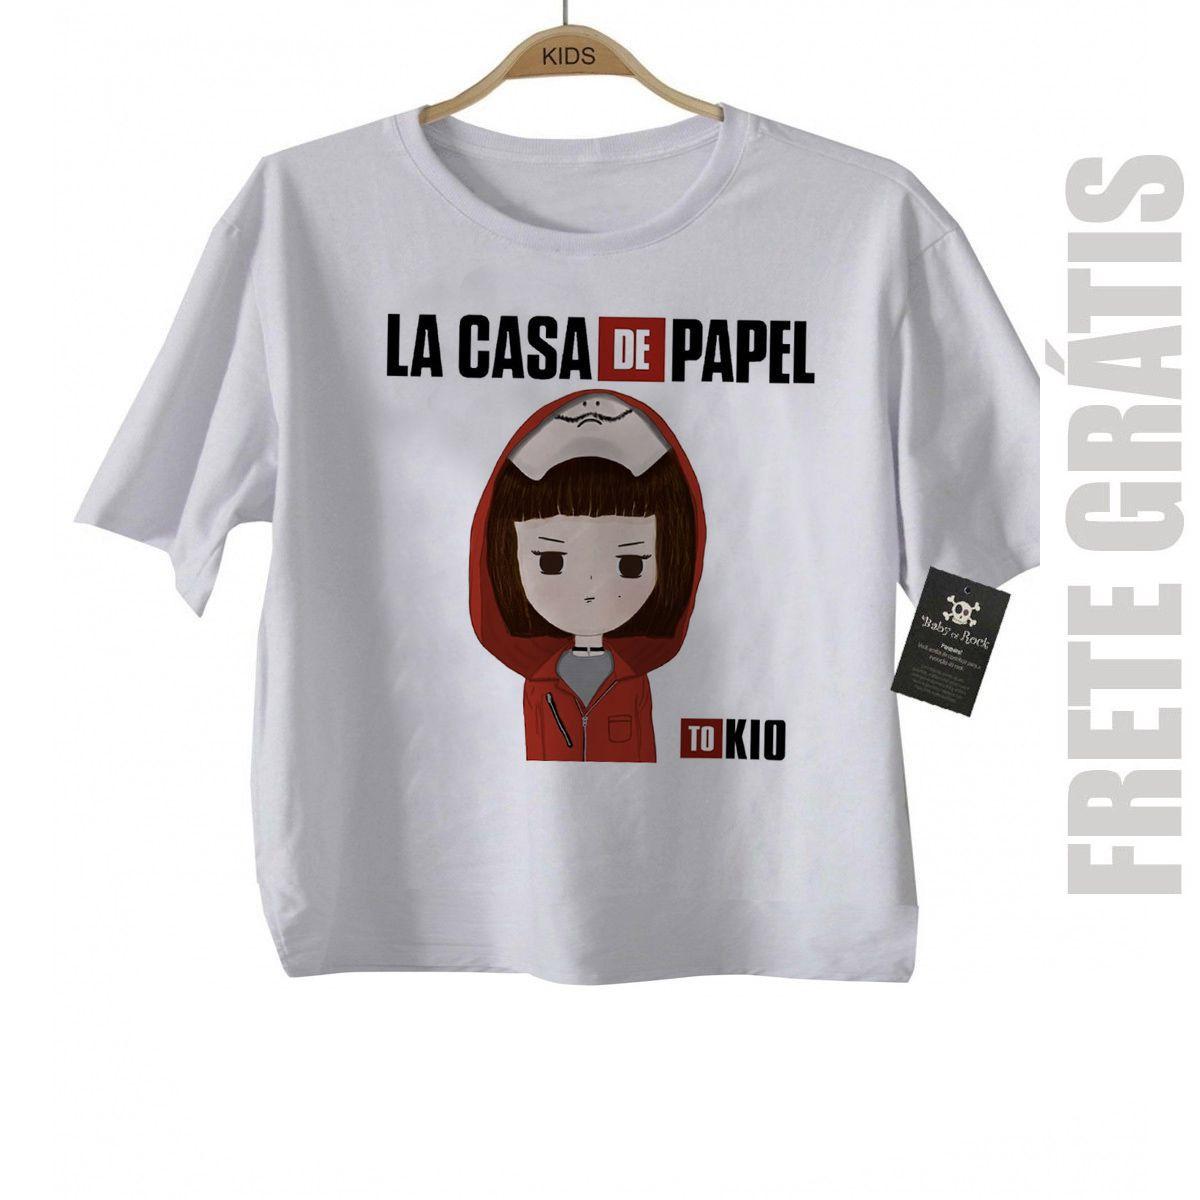 Camiseta Infantil La casa de Papel Tókio  - White  - Baby Monster - Body Bebe